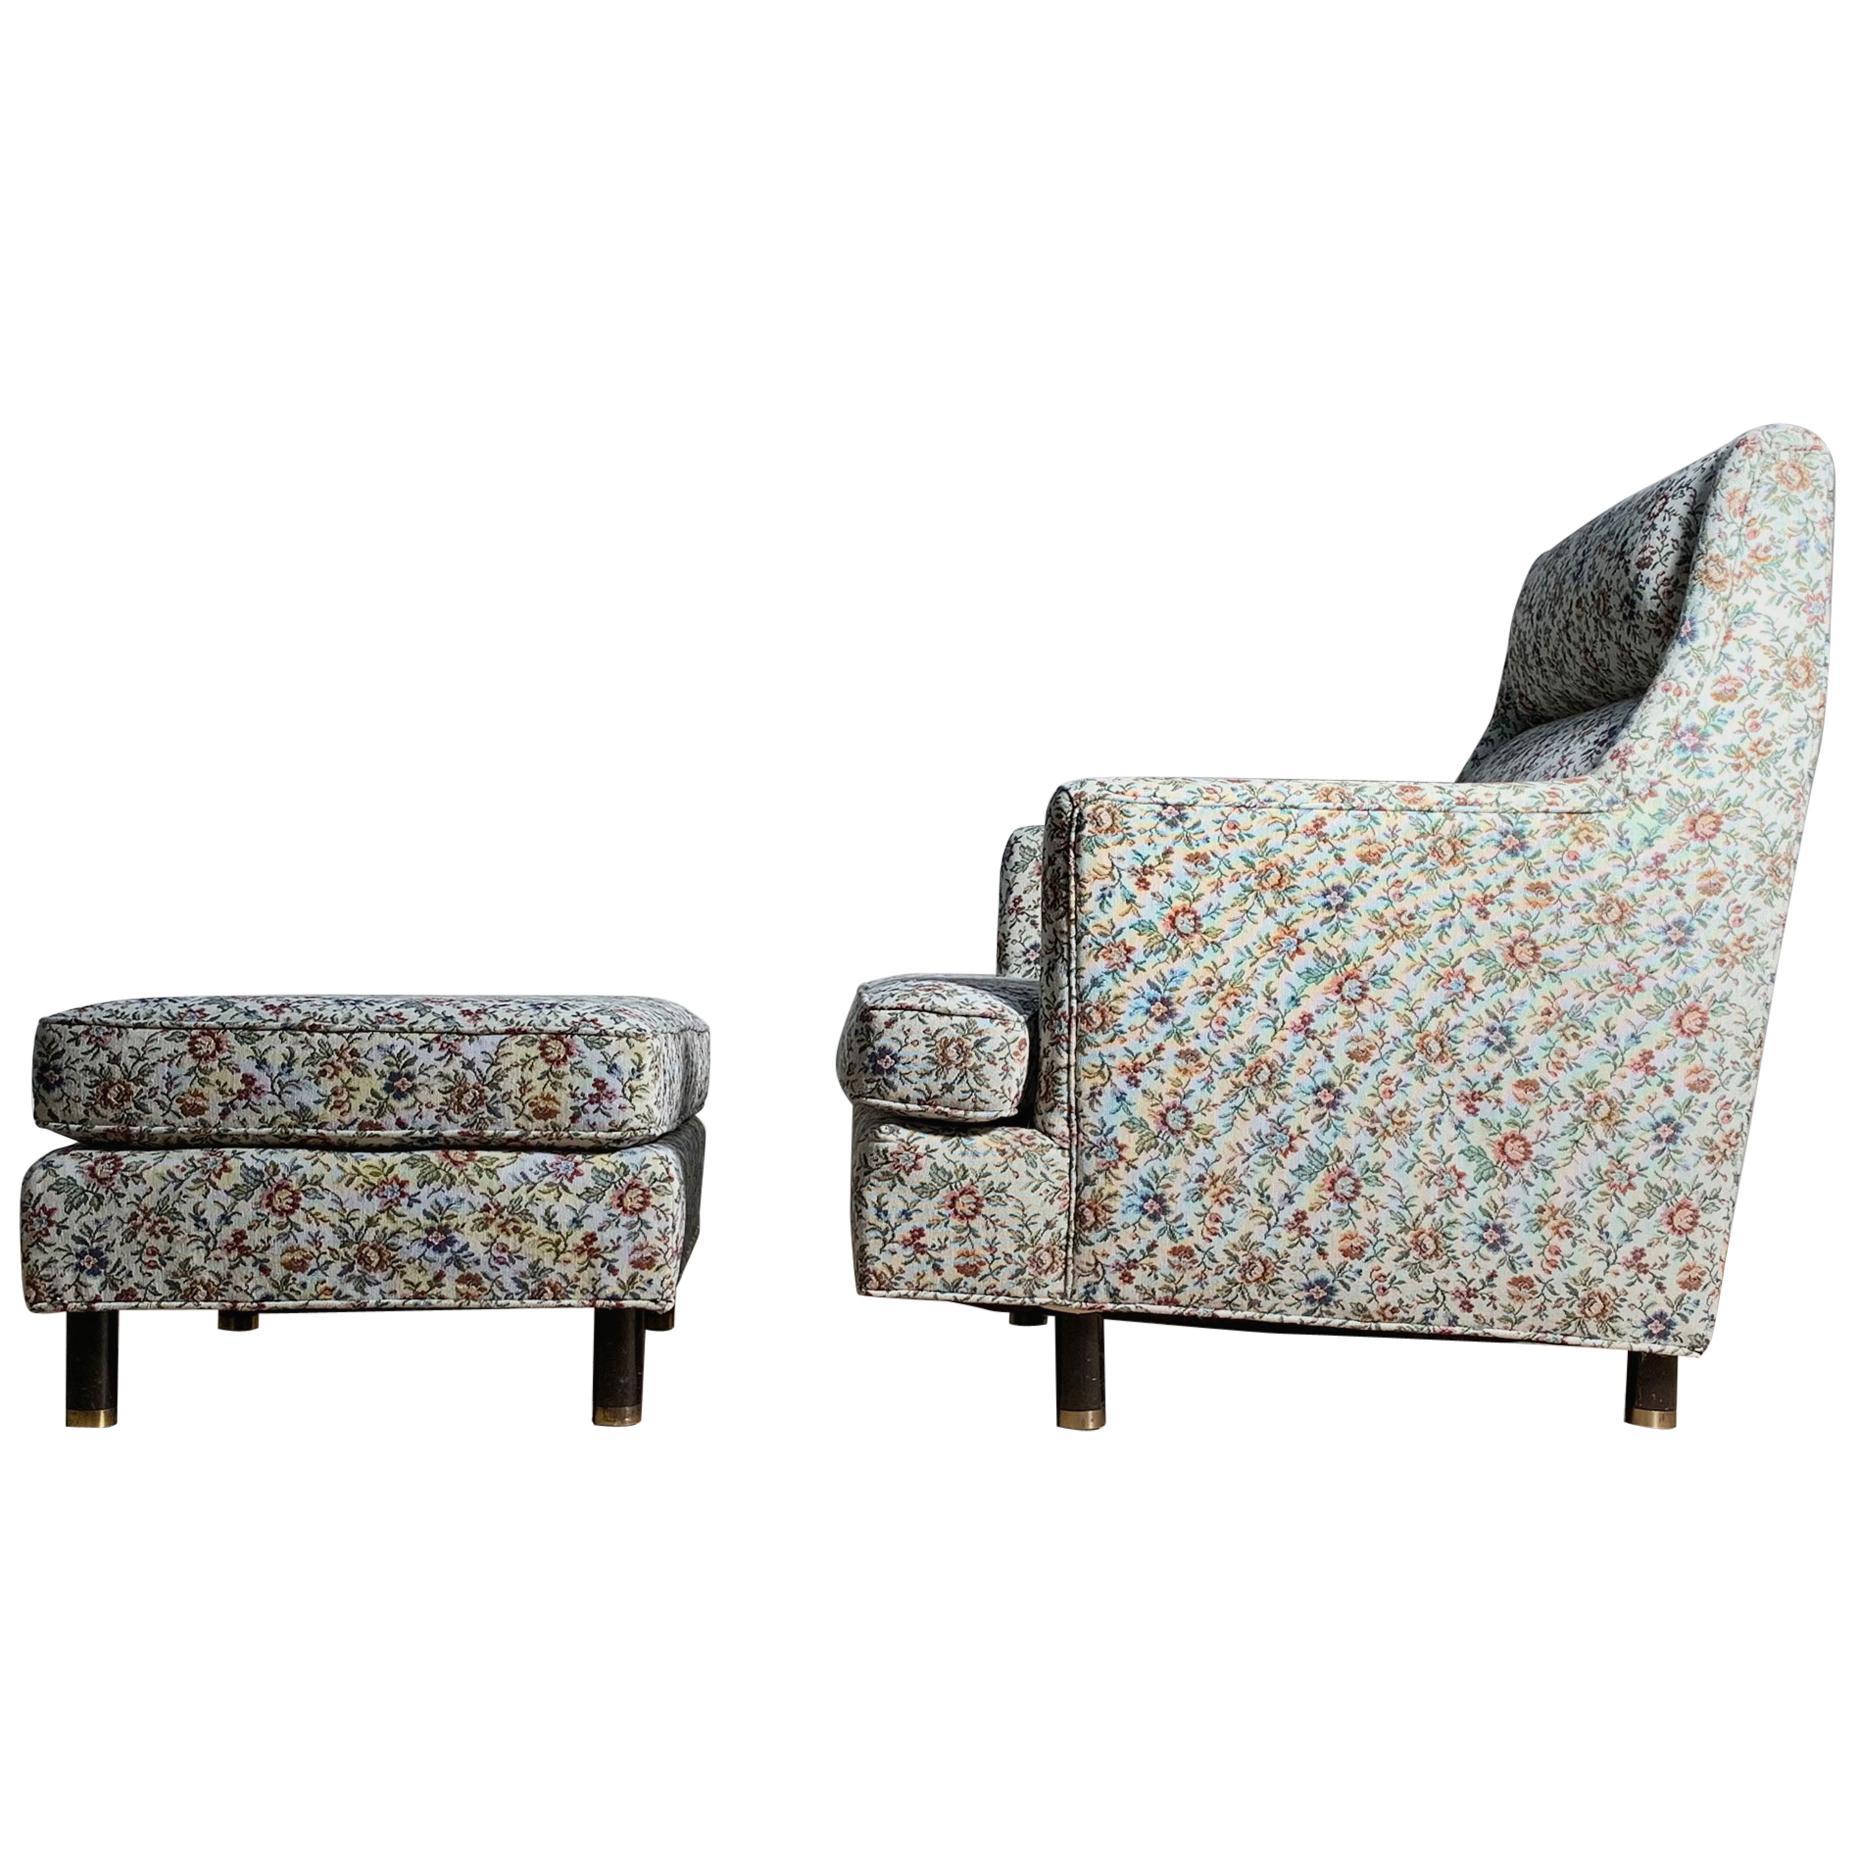 Edward Wormley Lounge Chair with Ottoman for Dunbar